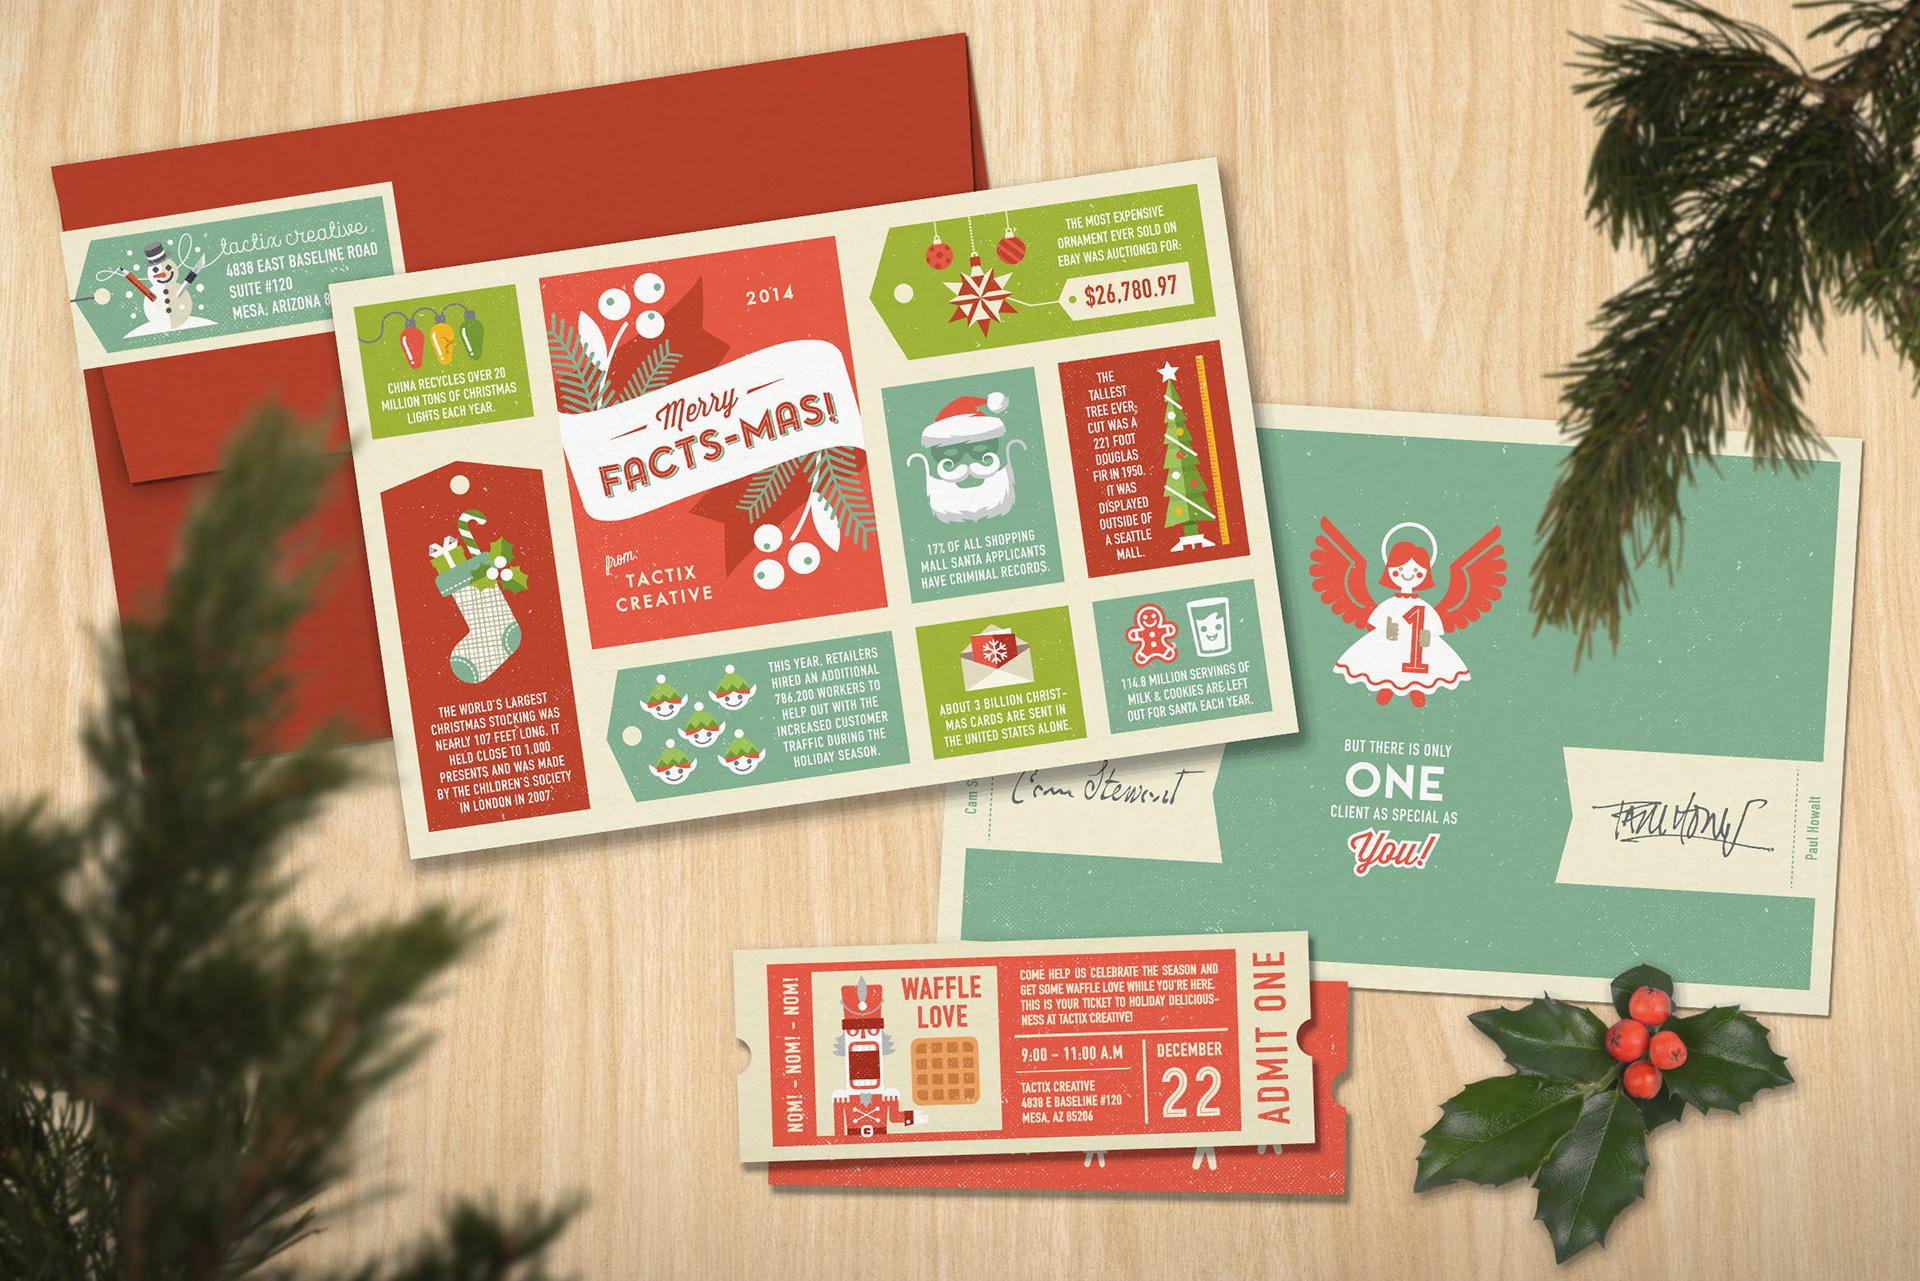 Paul Howalt - Tactix Creative Holiday Card